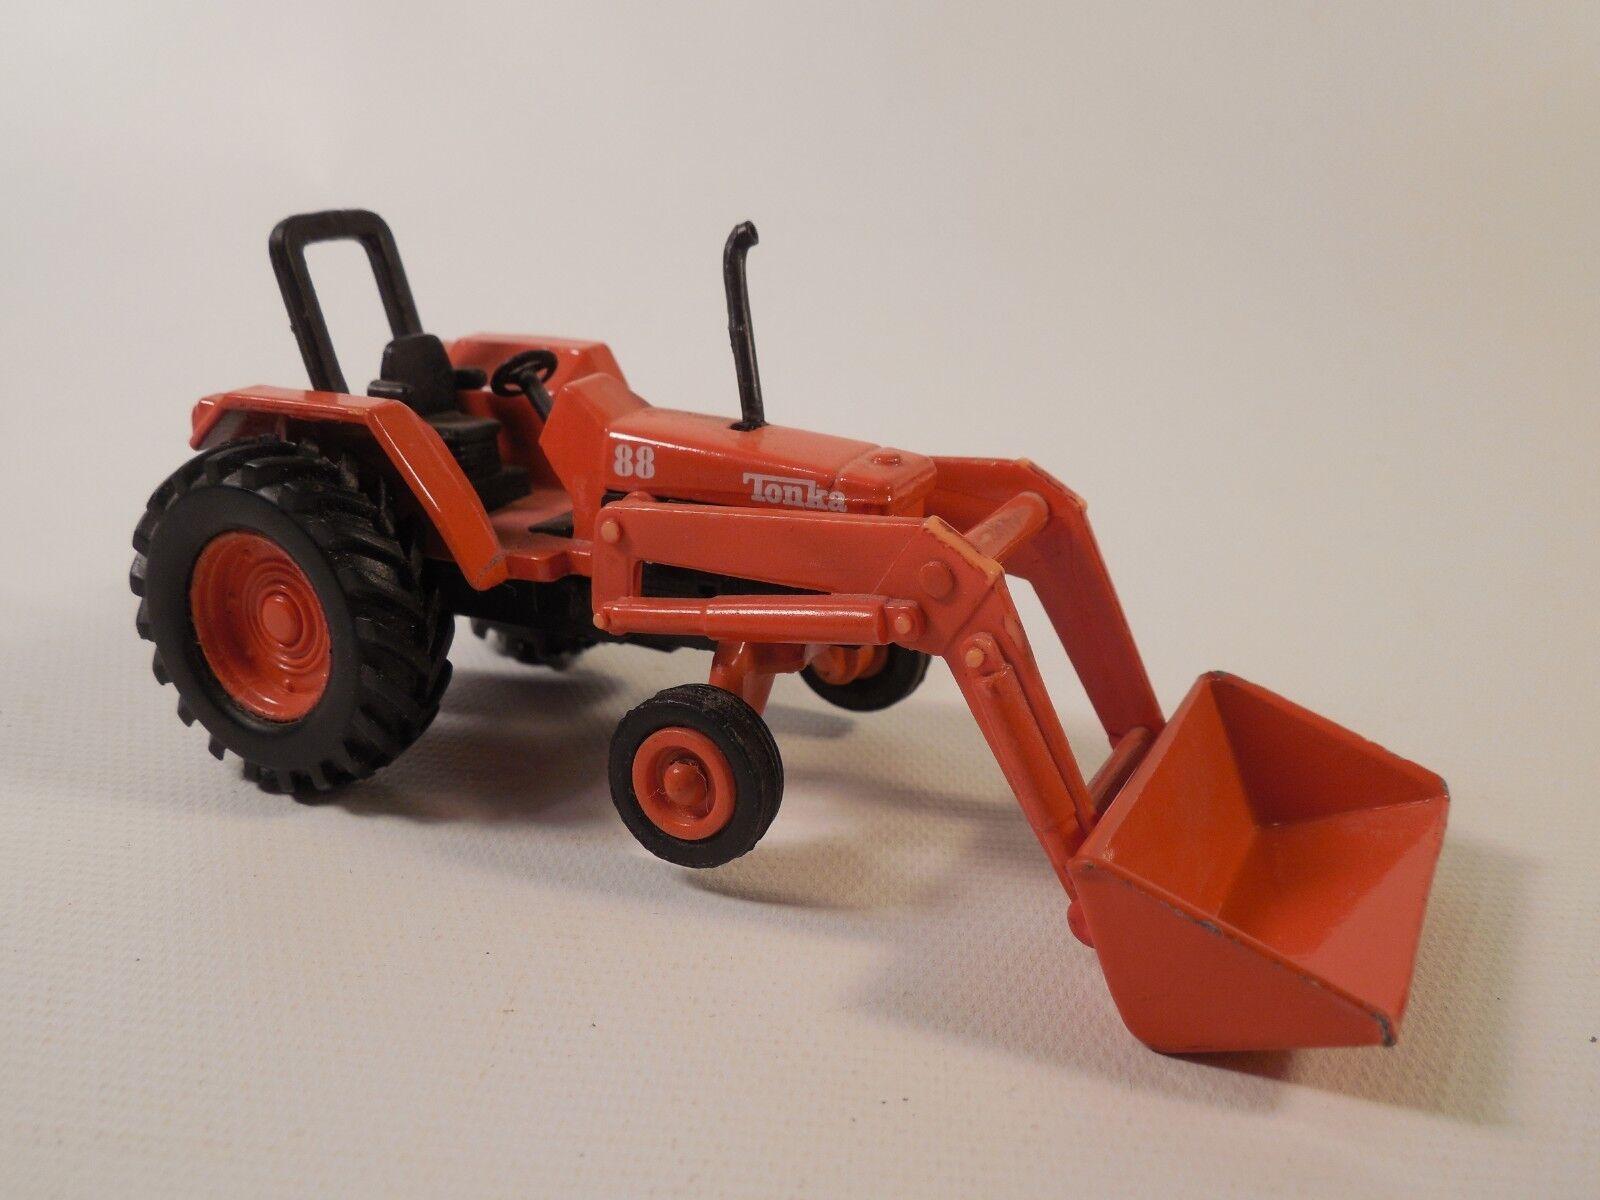 Tonka Die Cast orange Front Loader Tractor